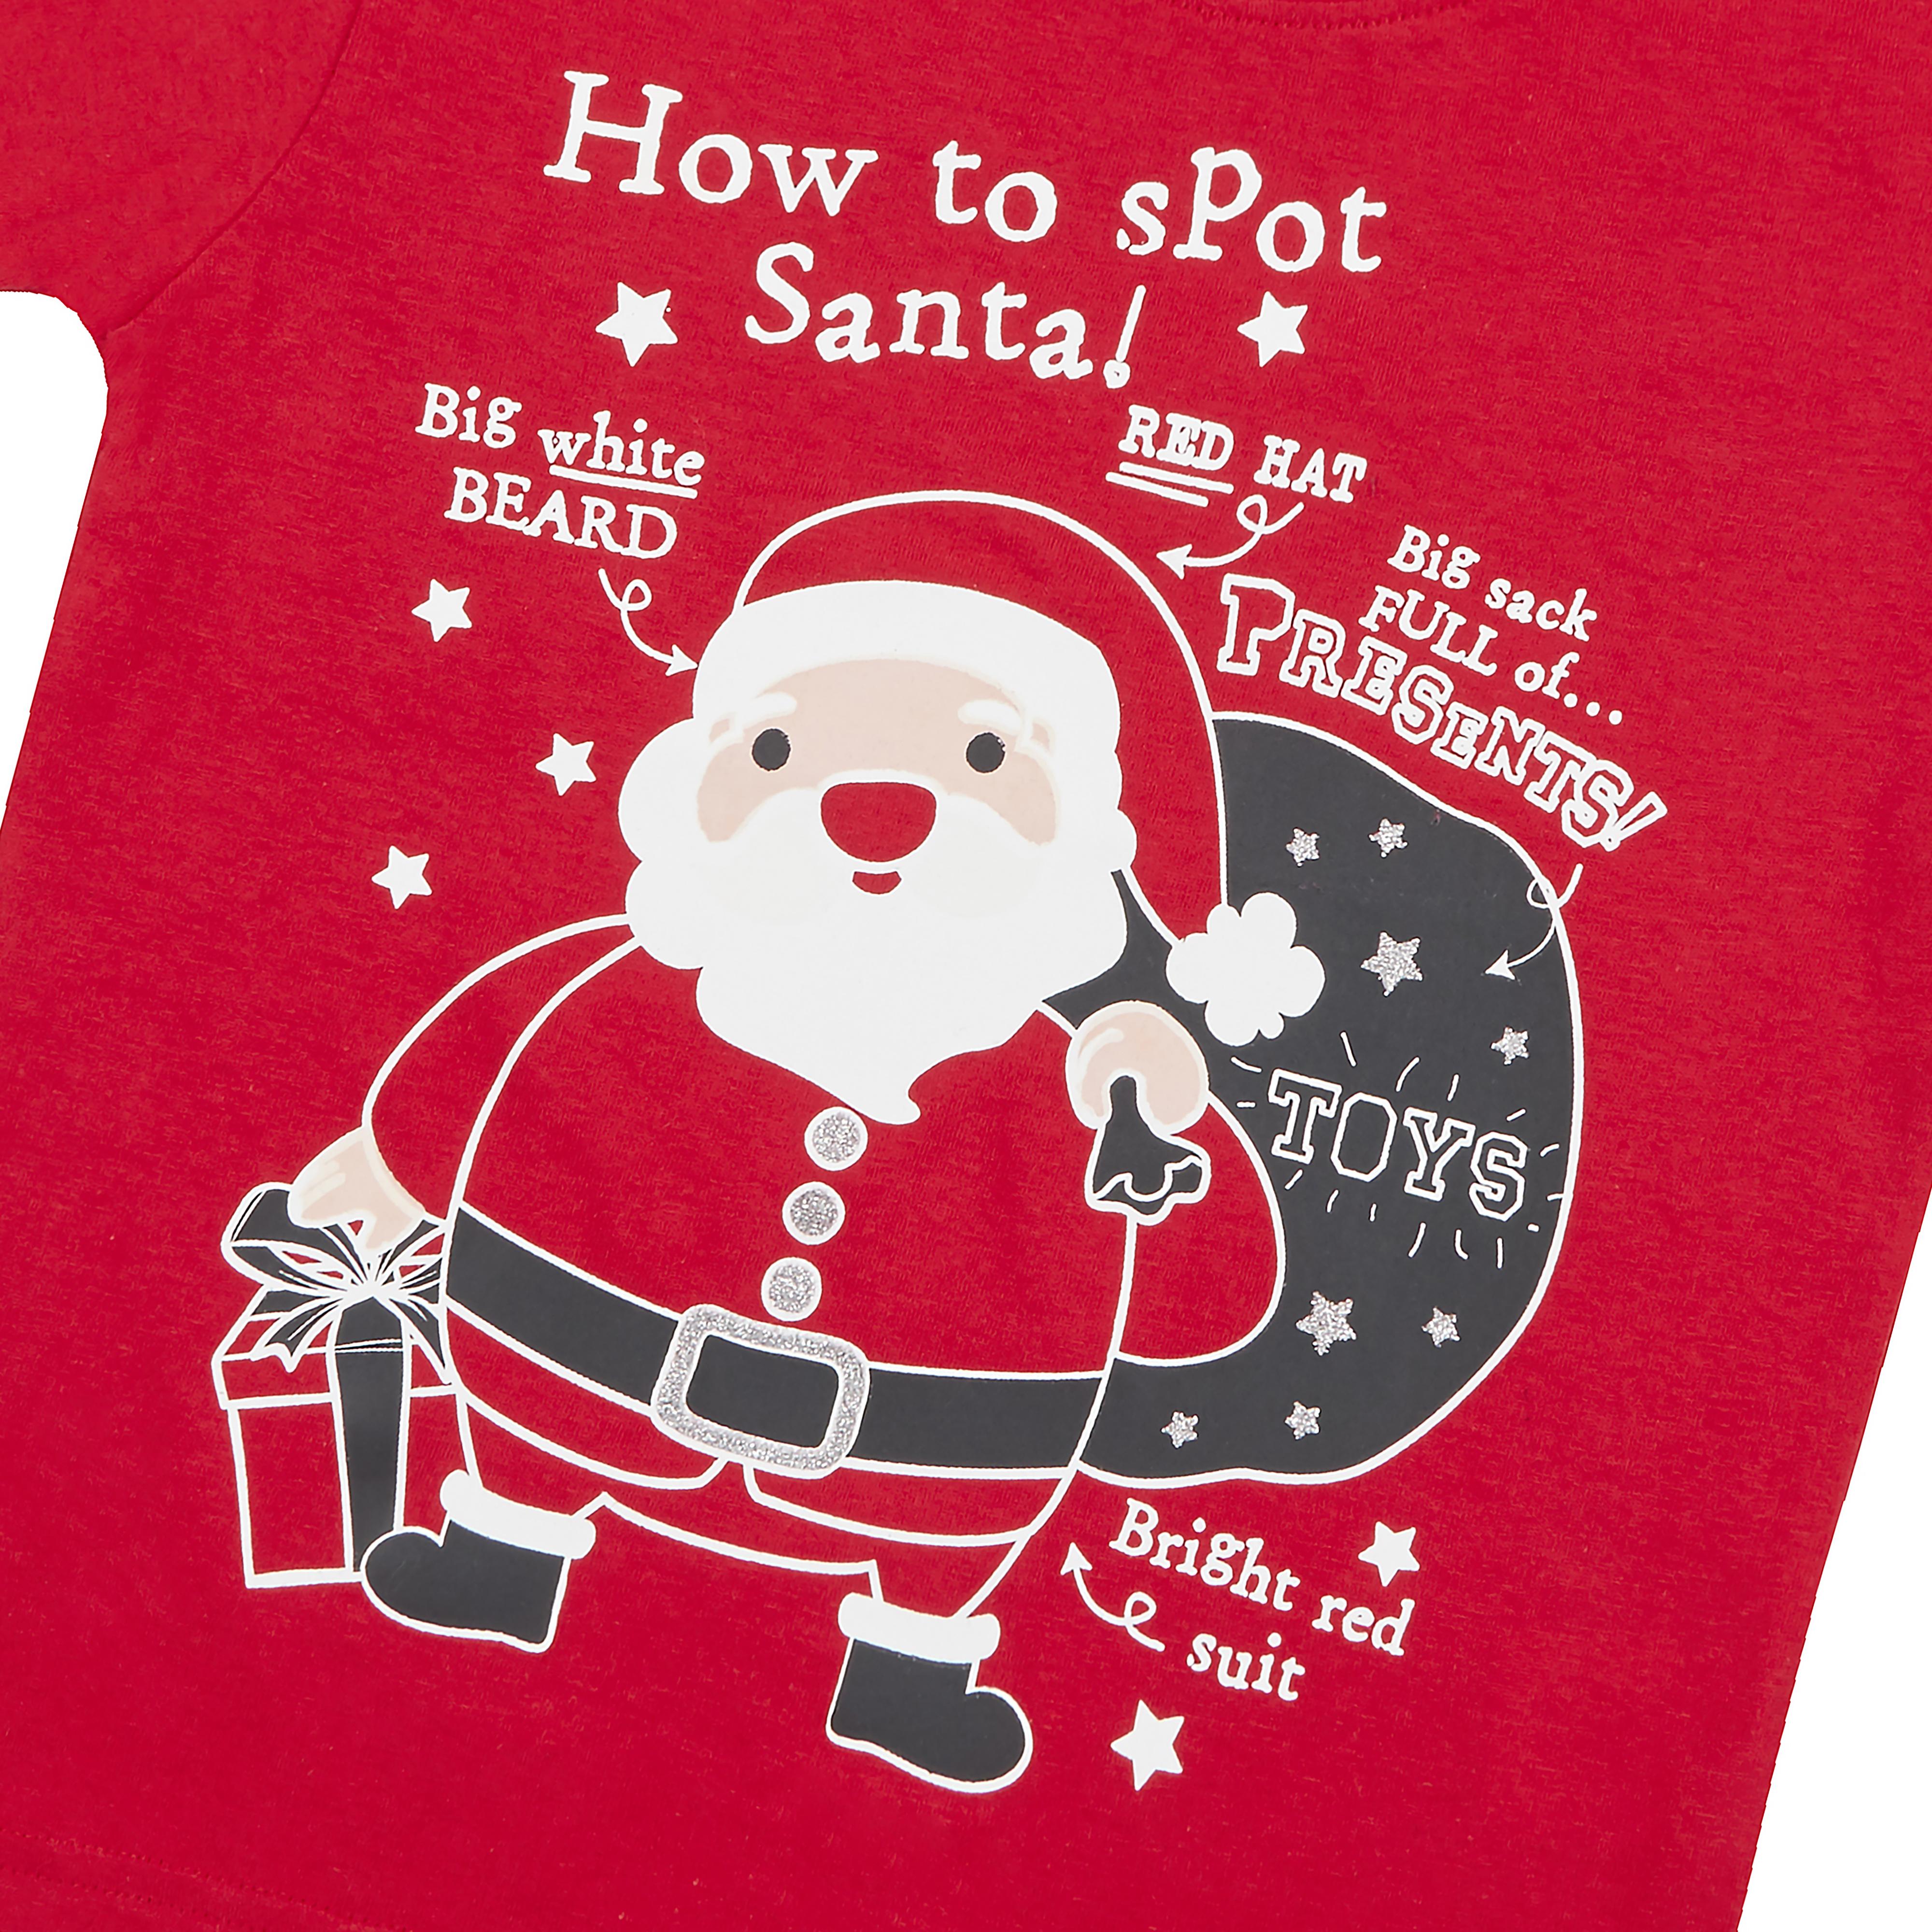 Childrens-Girls-Boys-Xmas-T-Shirts-Printed-Christmas-Design-100-Cotton-2-13-Yrs thumbnail 10